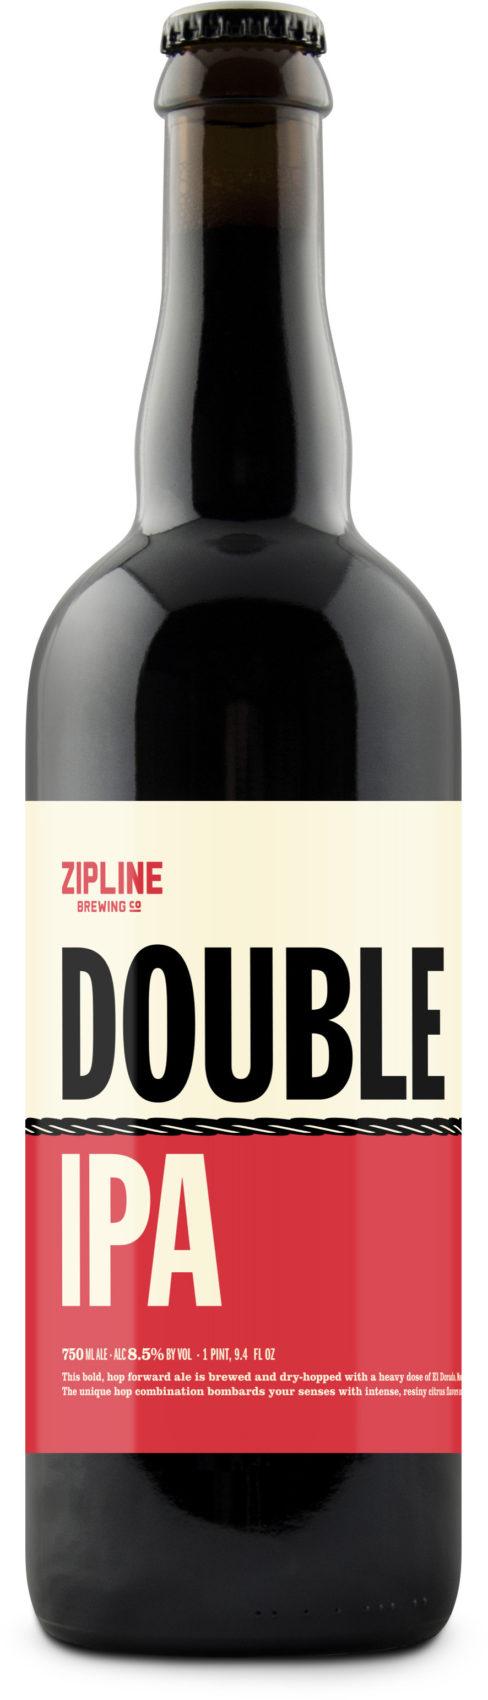 """doubleipa"""